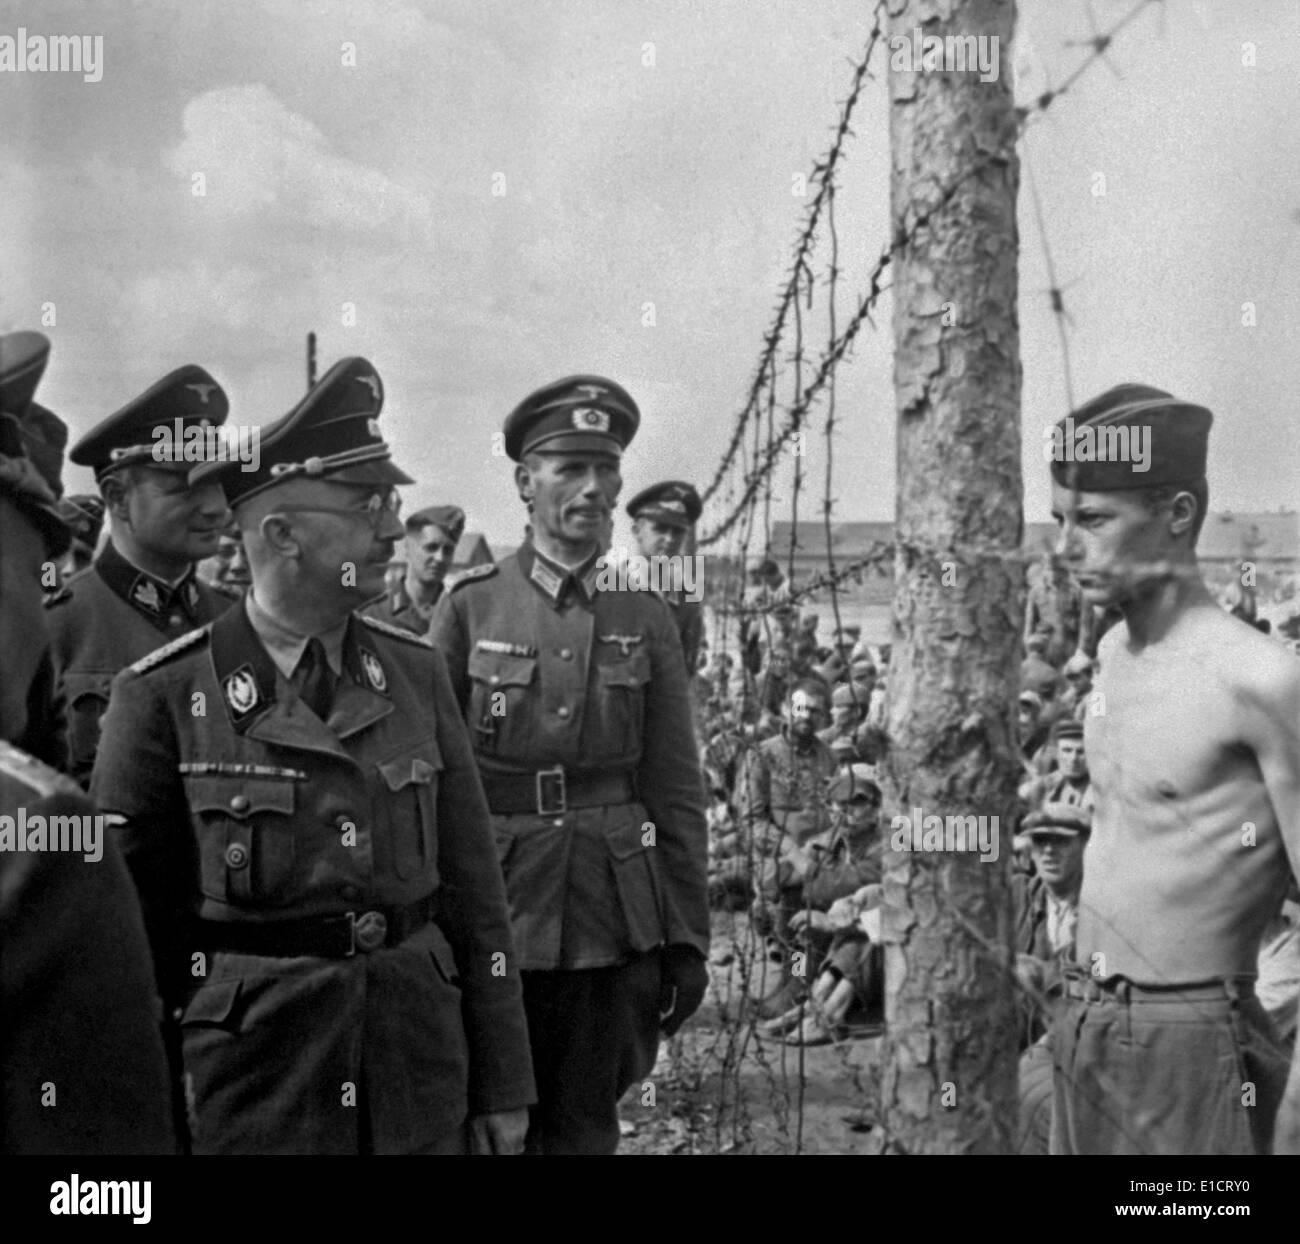 Heinrich Himmler, Head Of The Nazi SS, Inspects A Prisoner